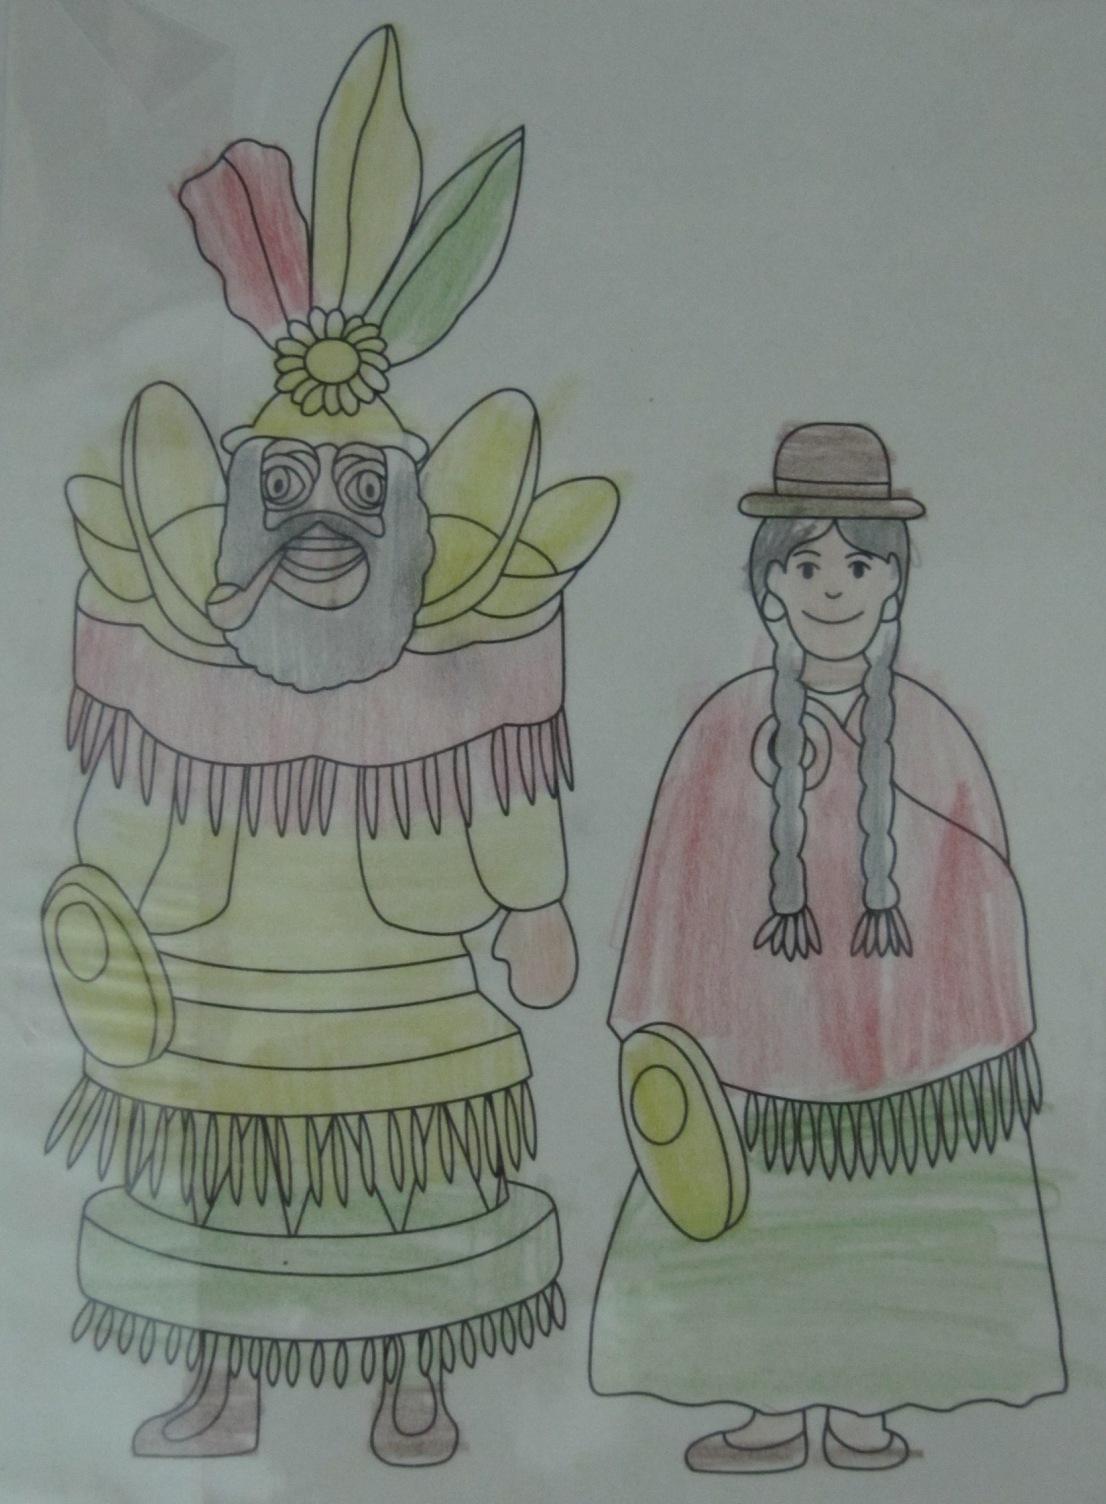 El Blog de MA: Dibujo de la danza de la morenada ,Bolivia ...